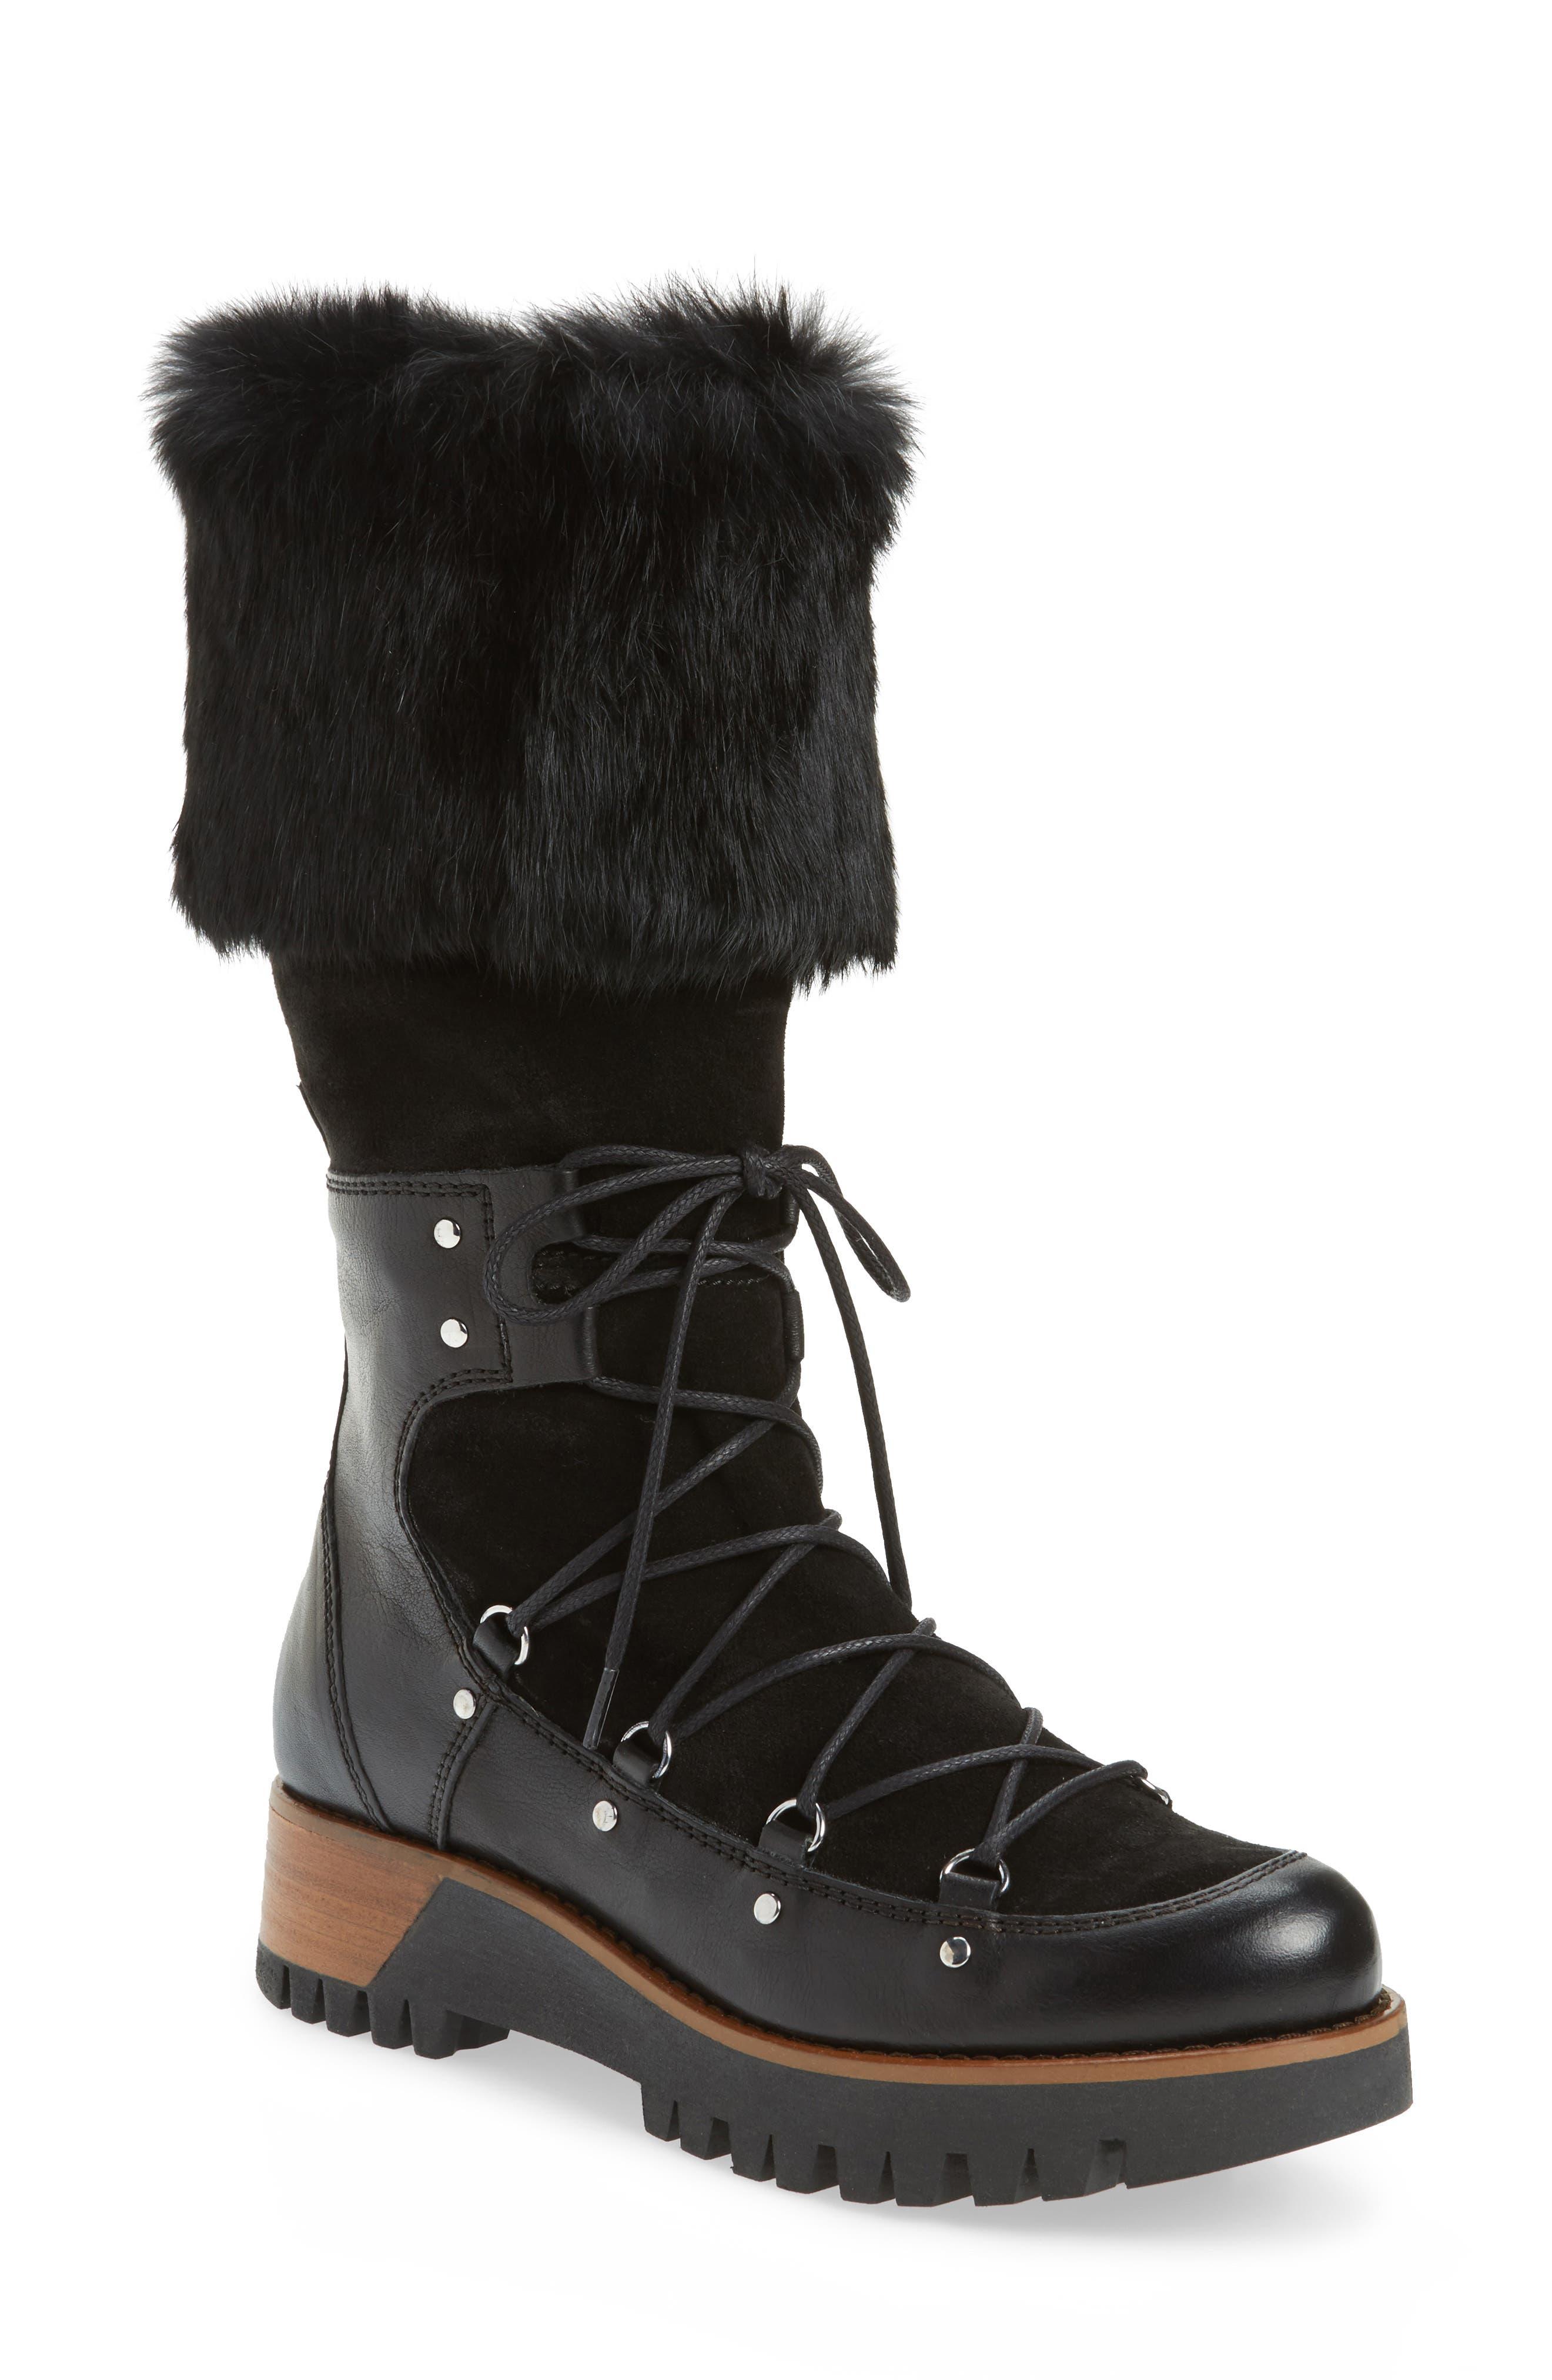 Tellurian Genuine Rabbit Fur Cuff Boot,                             Main thumbnail 1, color,                             Black Leather